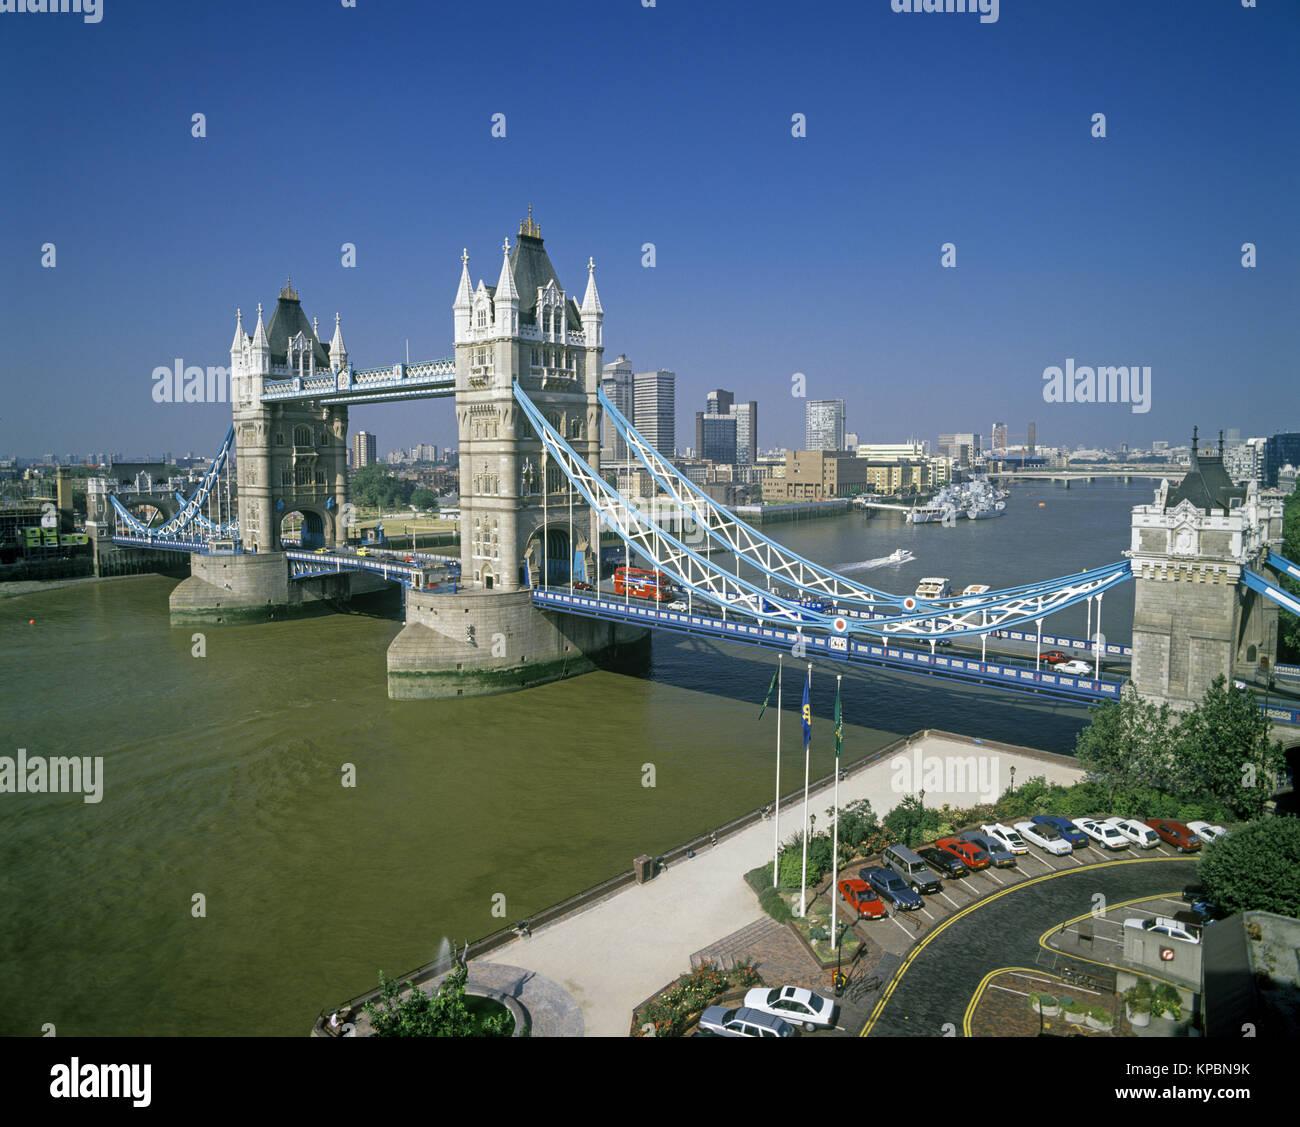 1989 HISTORICAL TOWER BRIDGE RIVER THAMES LONDON ENGLAND UK - Stock Image